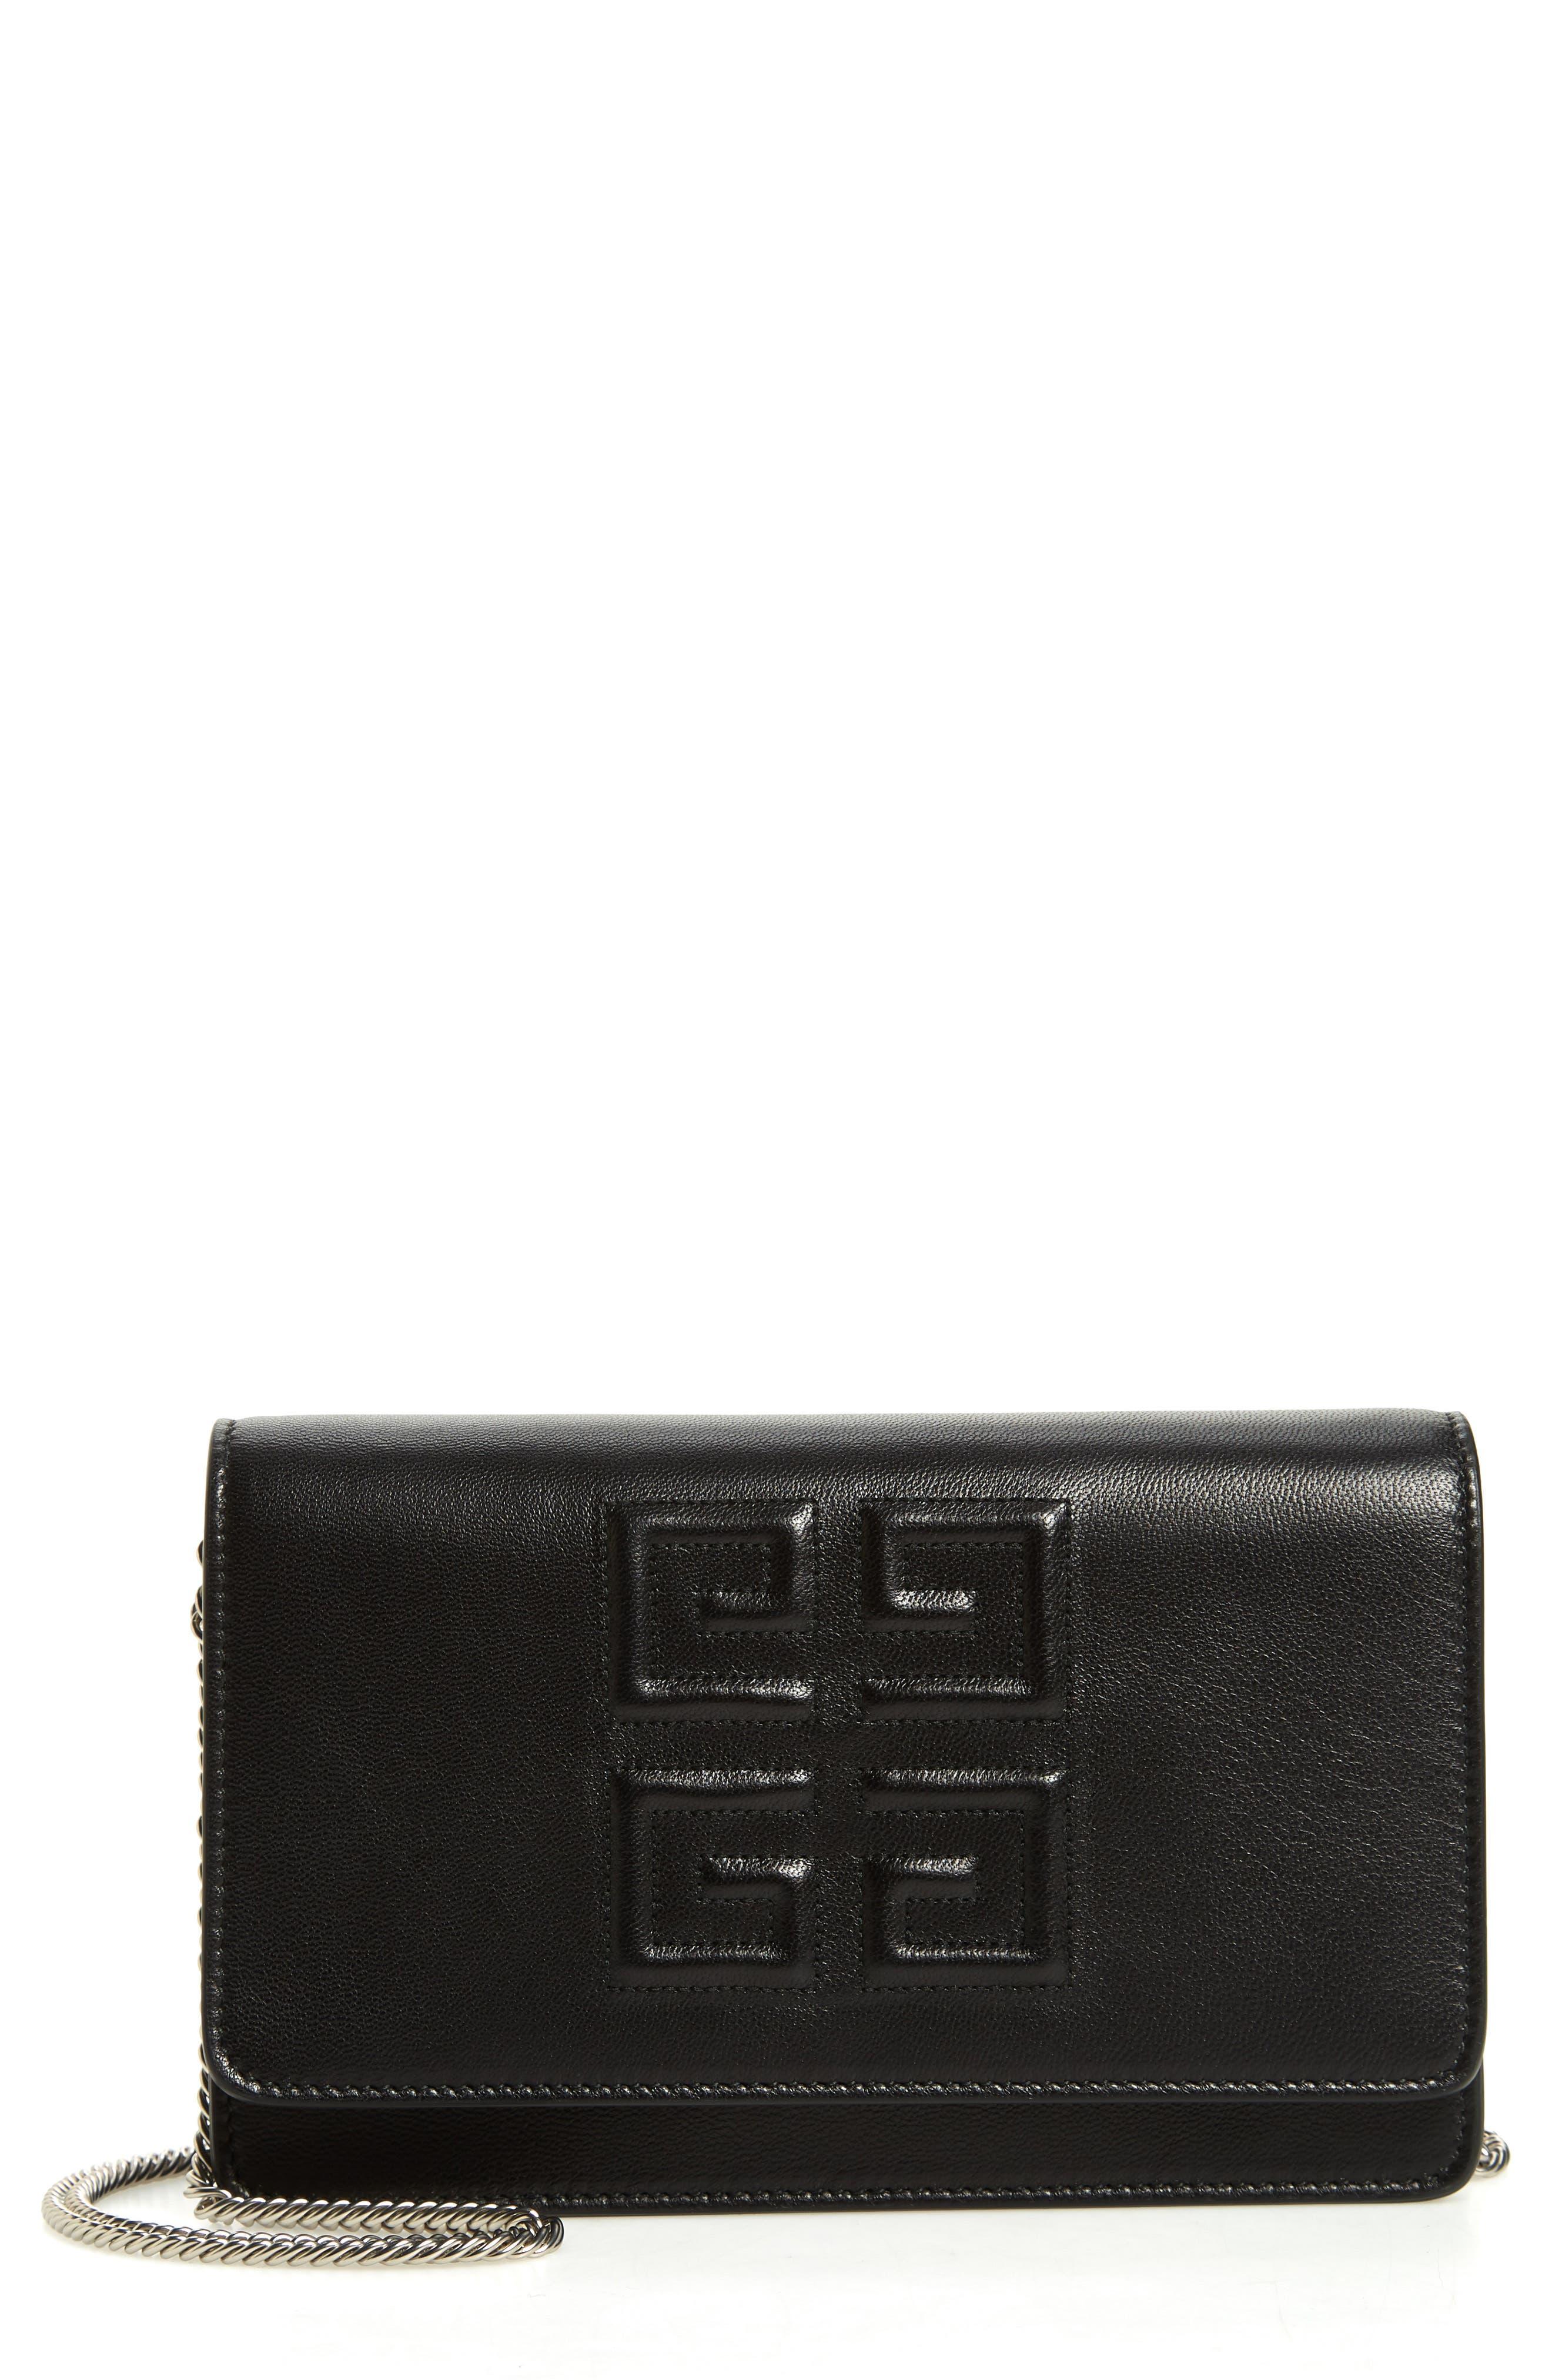 Emblem Lambskin Leather Crossbody Bag,                         Main,                         color, BLACK